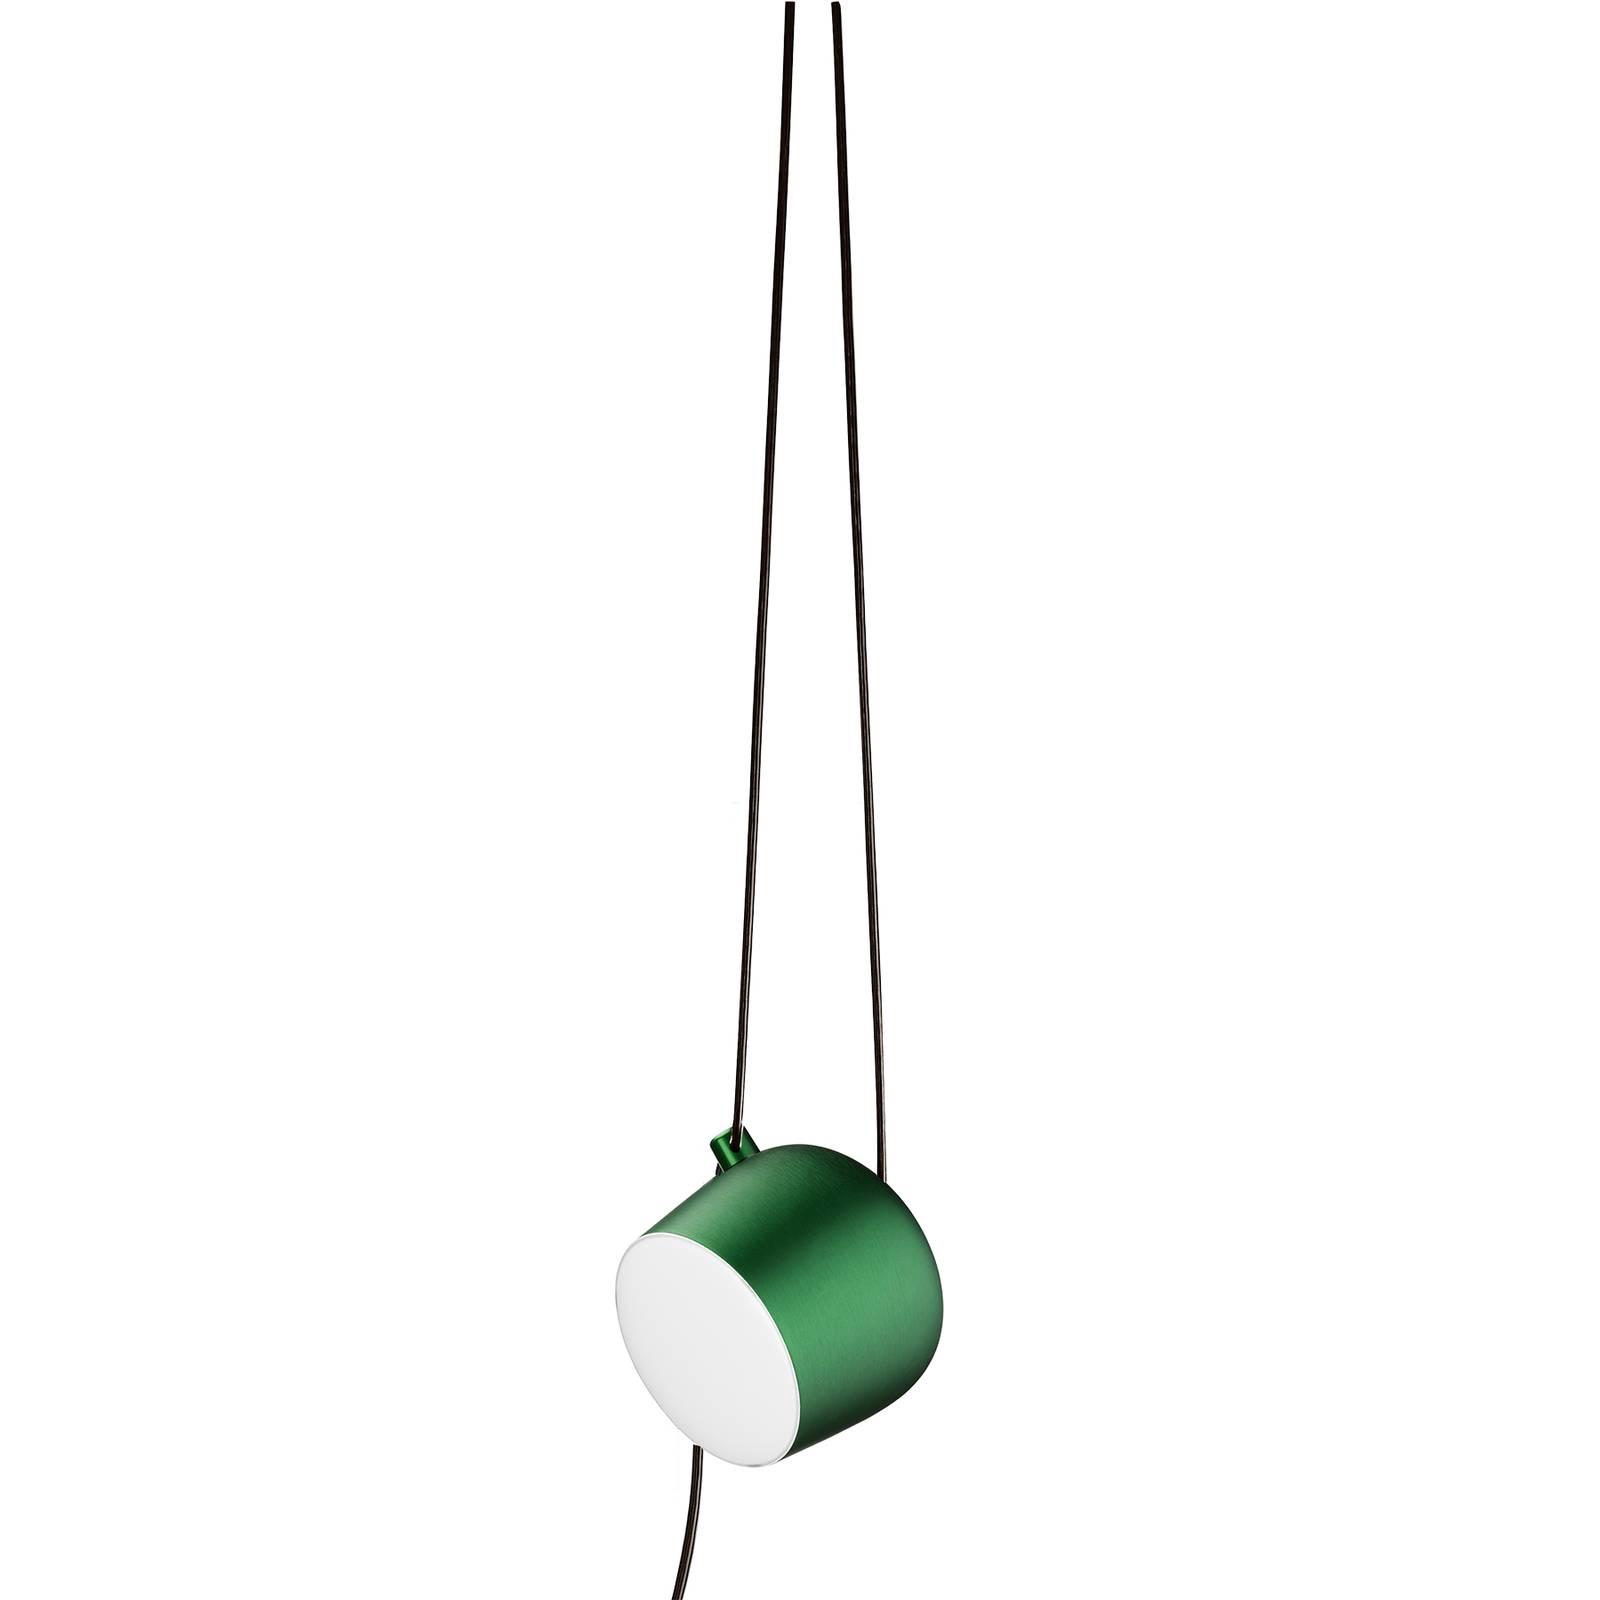 FLOS Aim Small LED-Hängeleuchte, grün